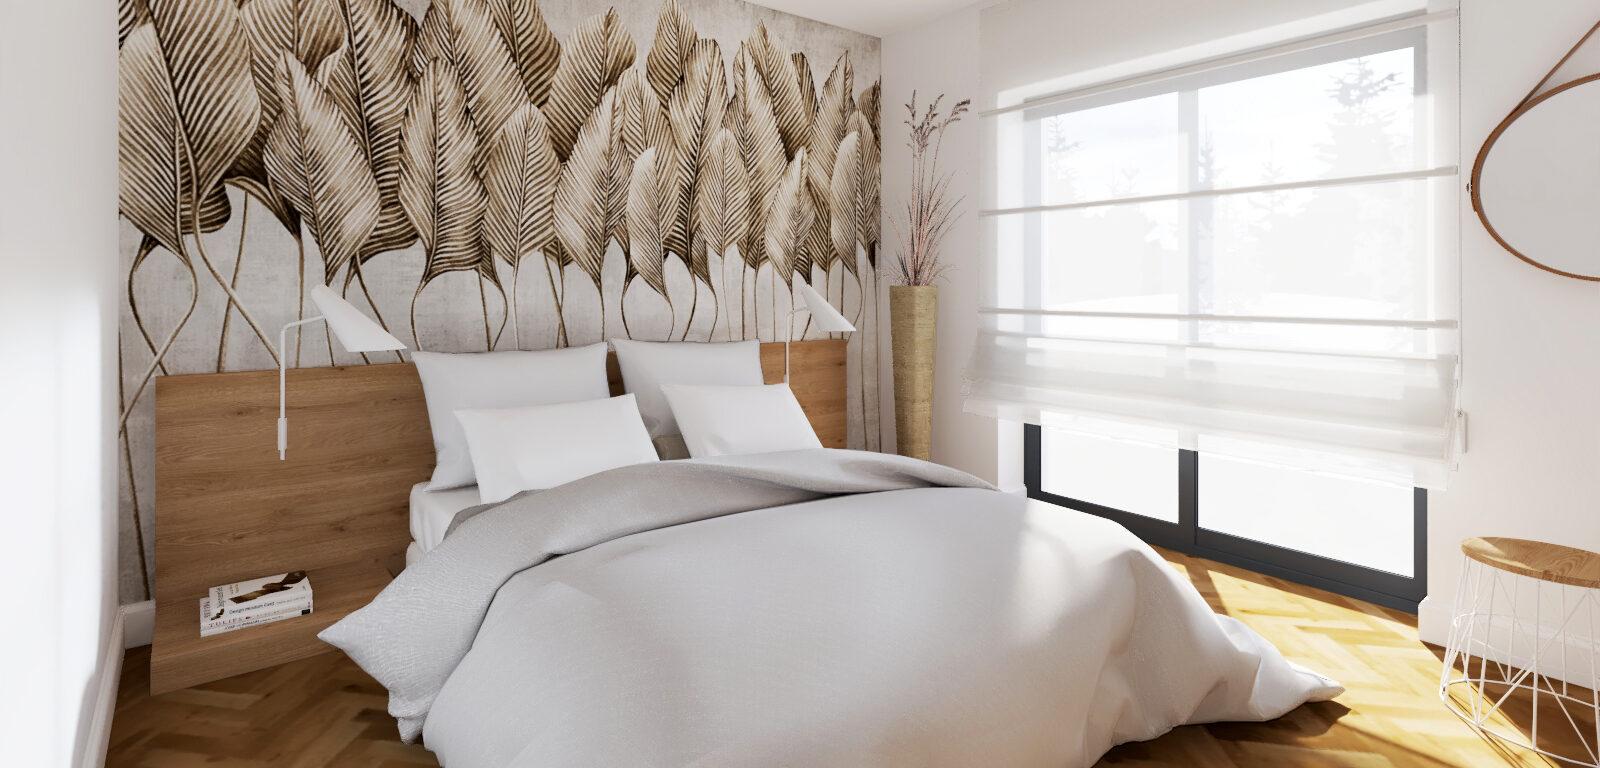 dacon-design-domanska-architekt-stodola-wnetrza-sypialnia-tapeta-garderoba